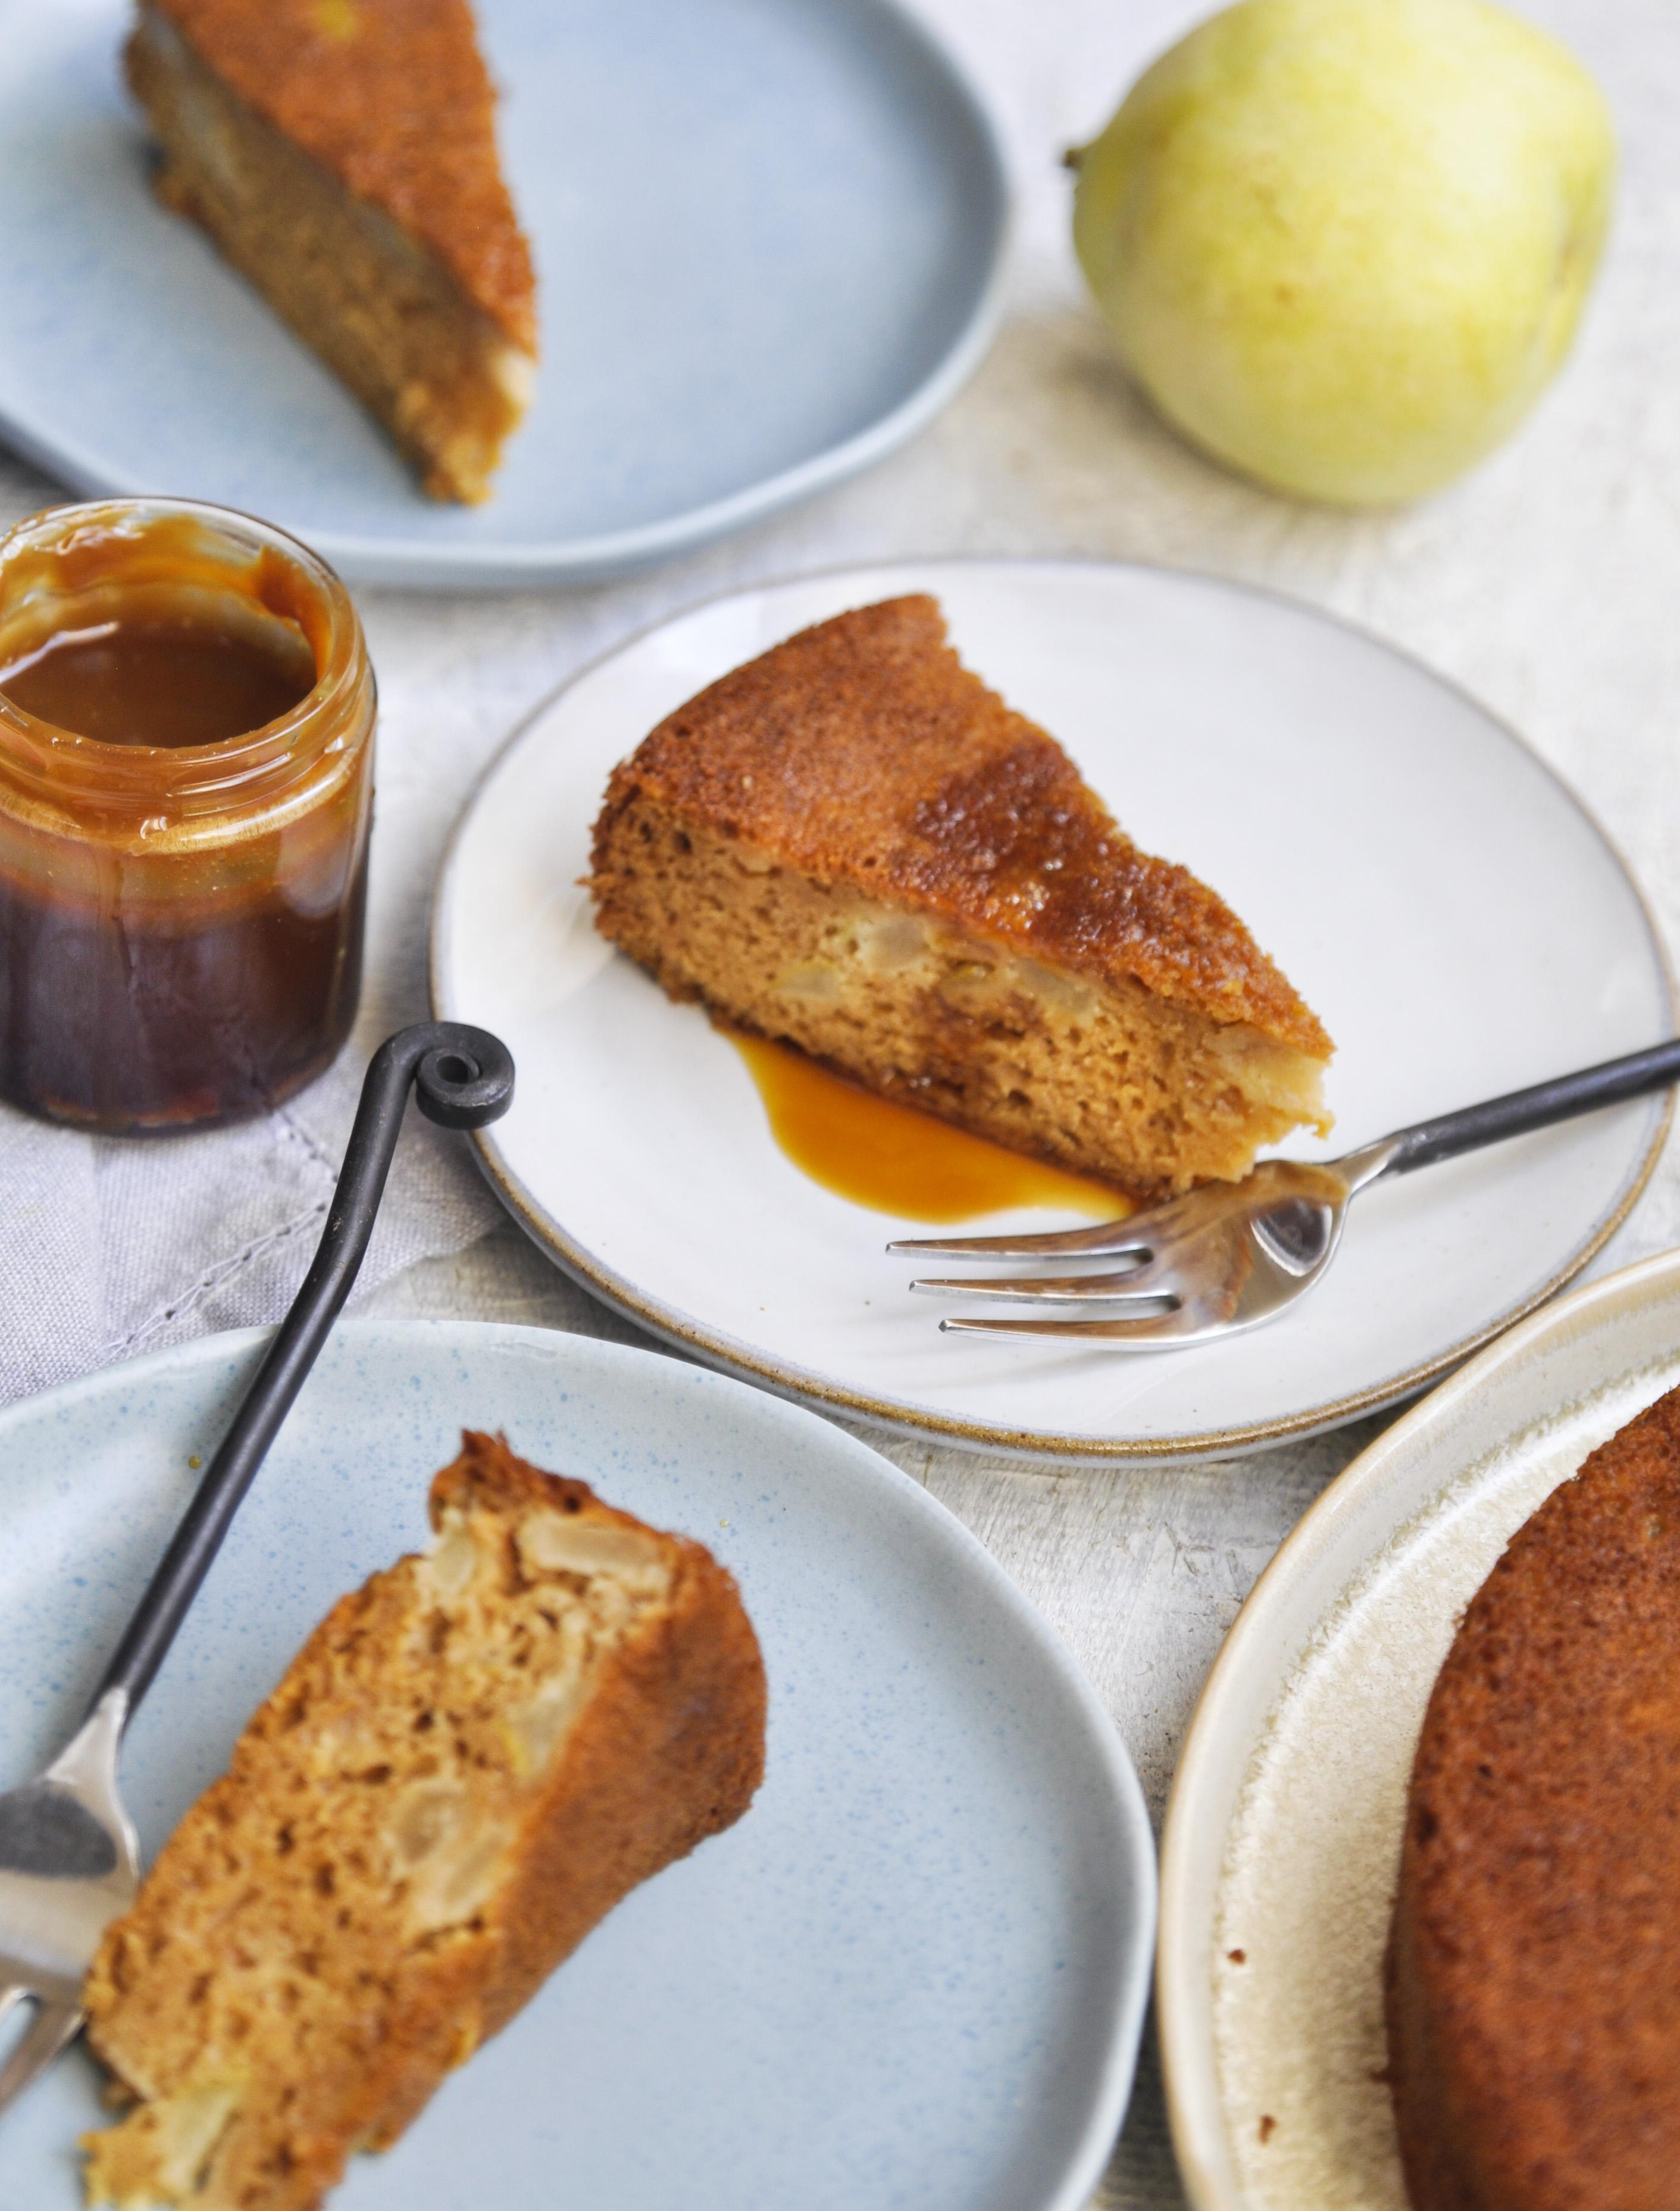 how to make pear cake, apple cake recipe, pear cake recipe, homemade caramel, caramel cake, pear caramel cake, fall recipes, fall baking